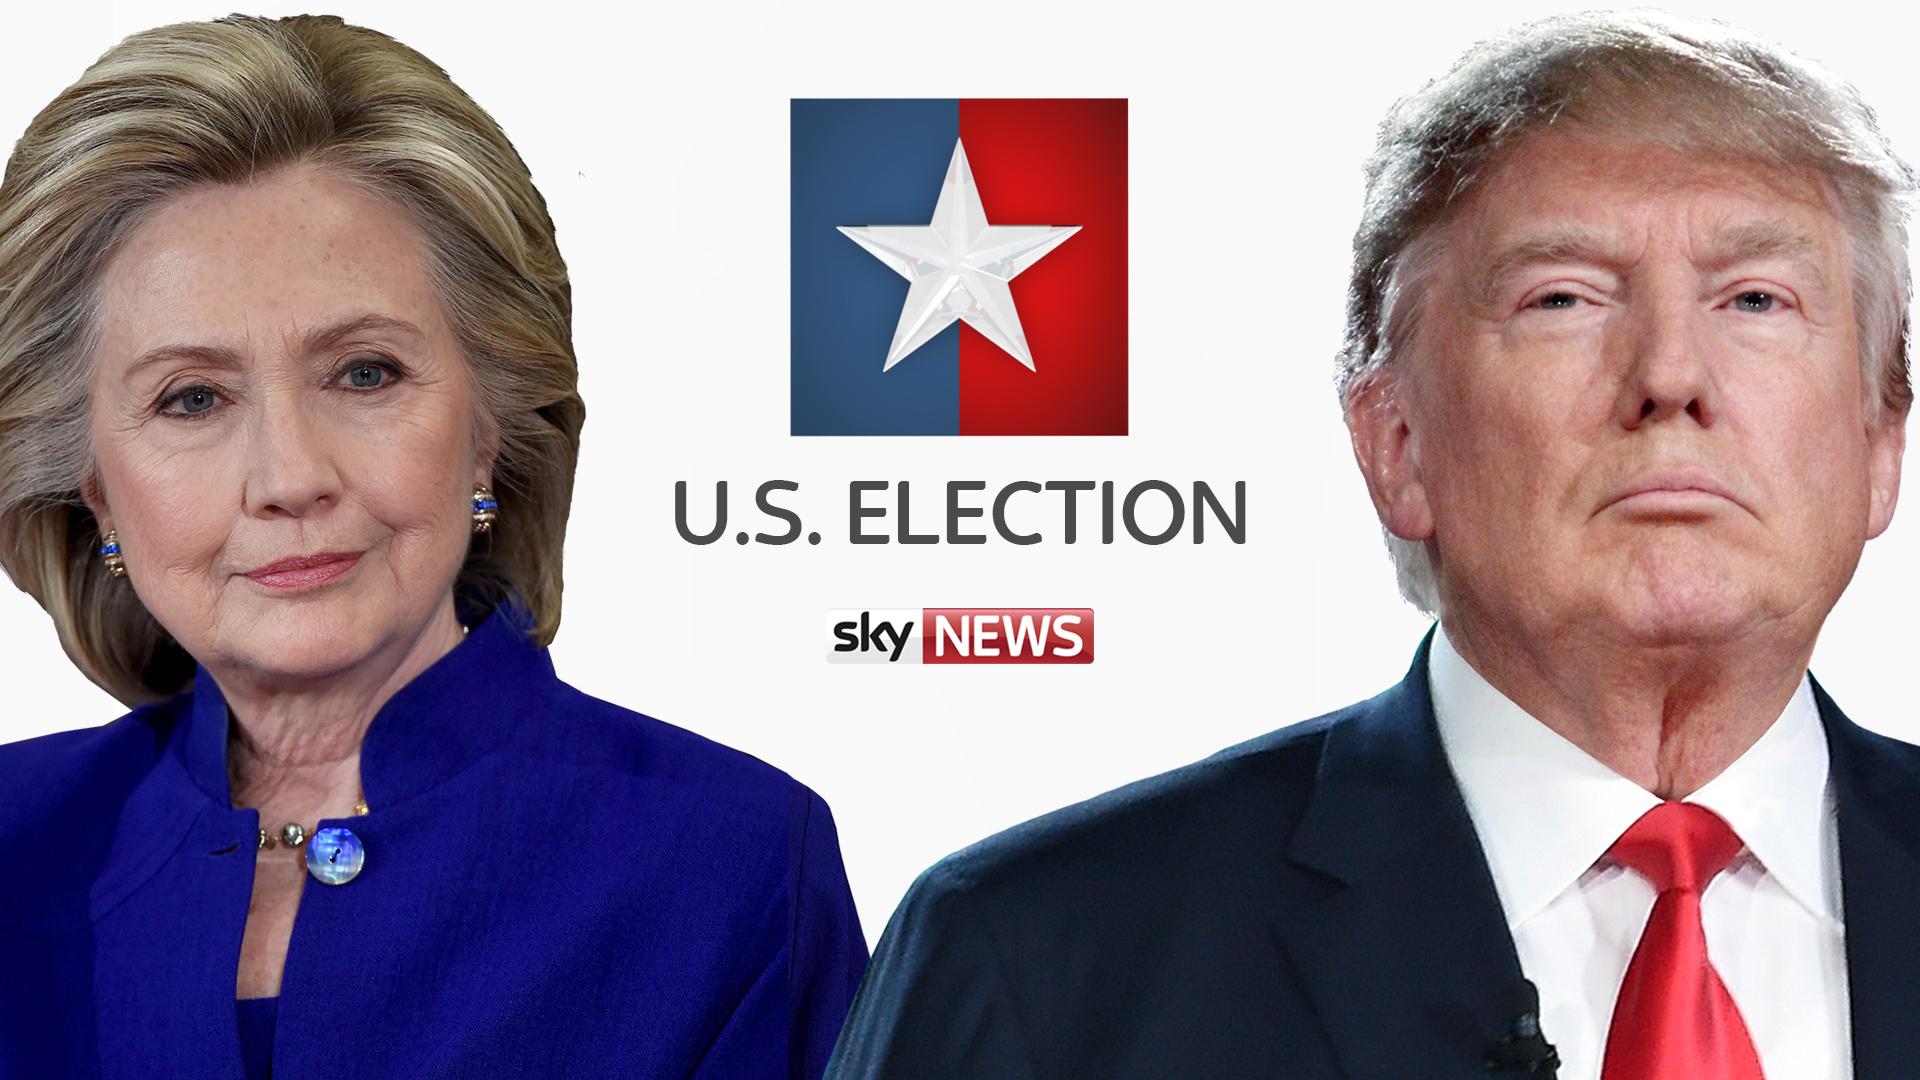 U.S. Election Results 2016 – Live TV Coverage on BBC, ITV, Sky News